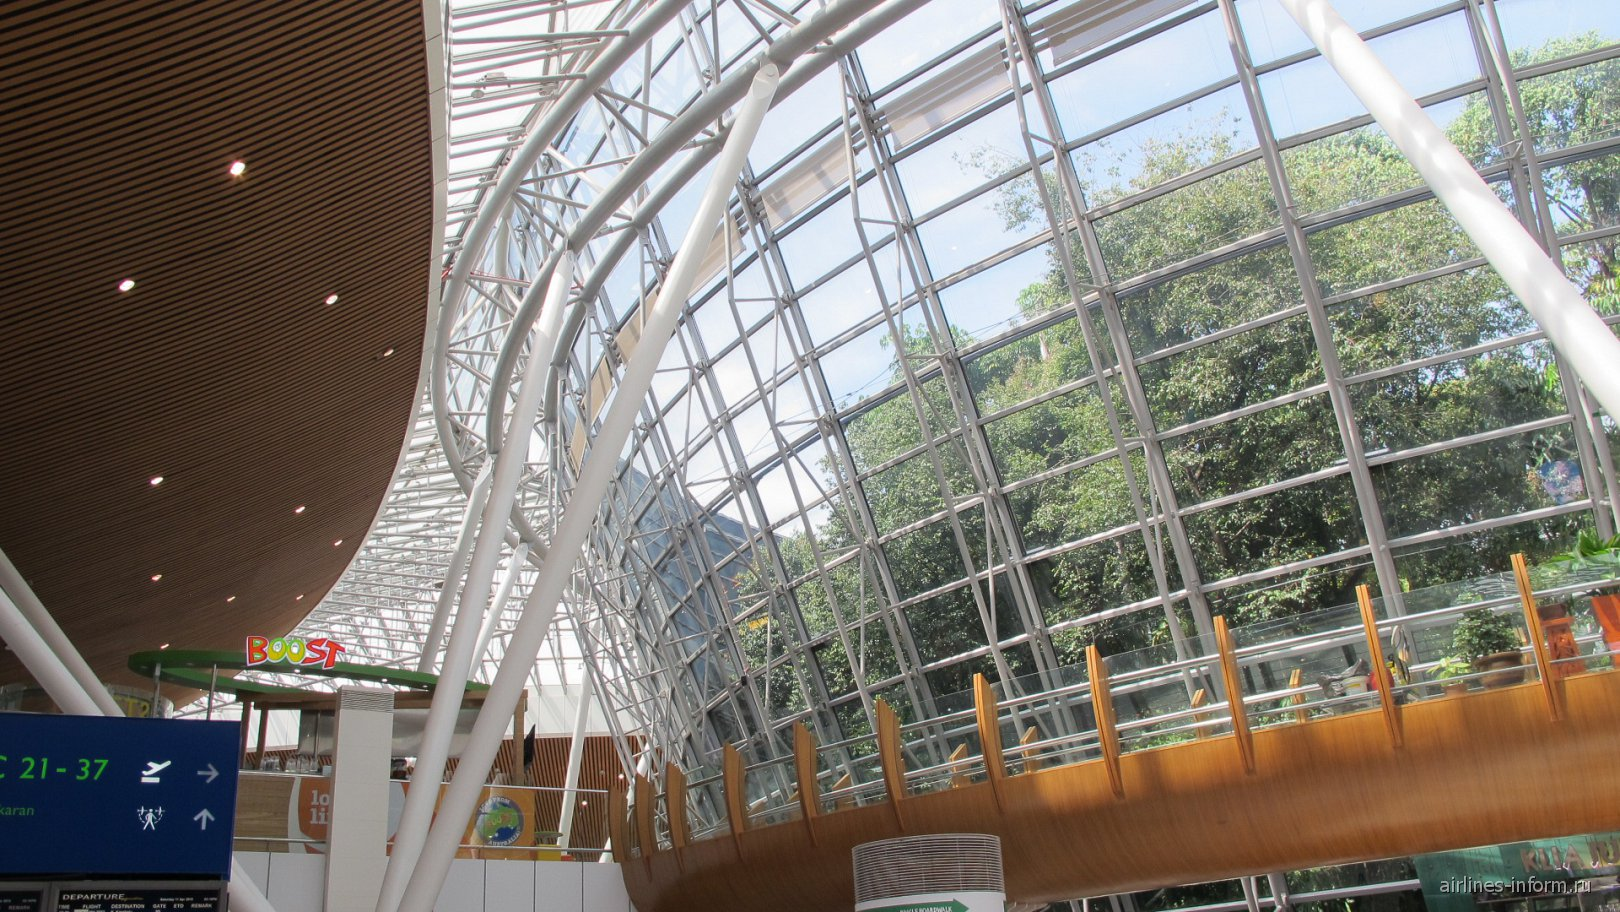 В спутниковом терминале аэропорта Куала-Лумпур